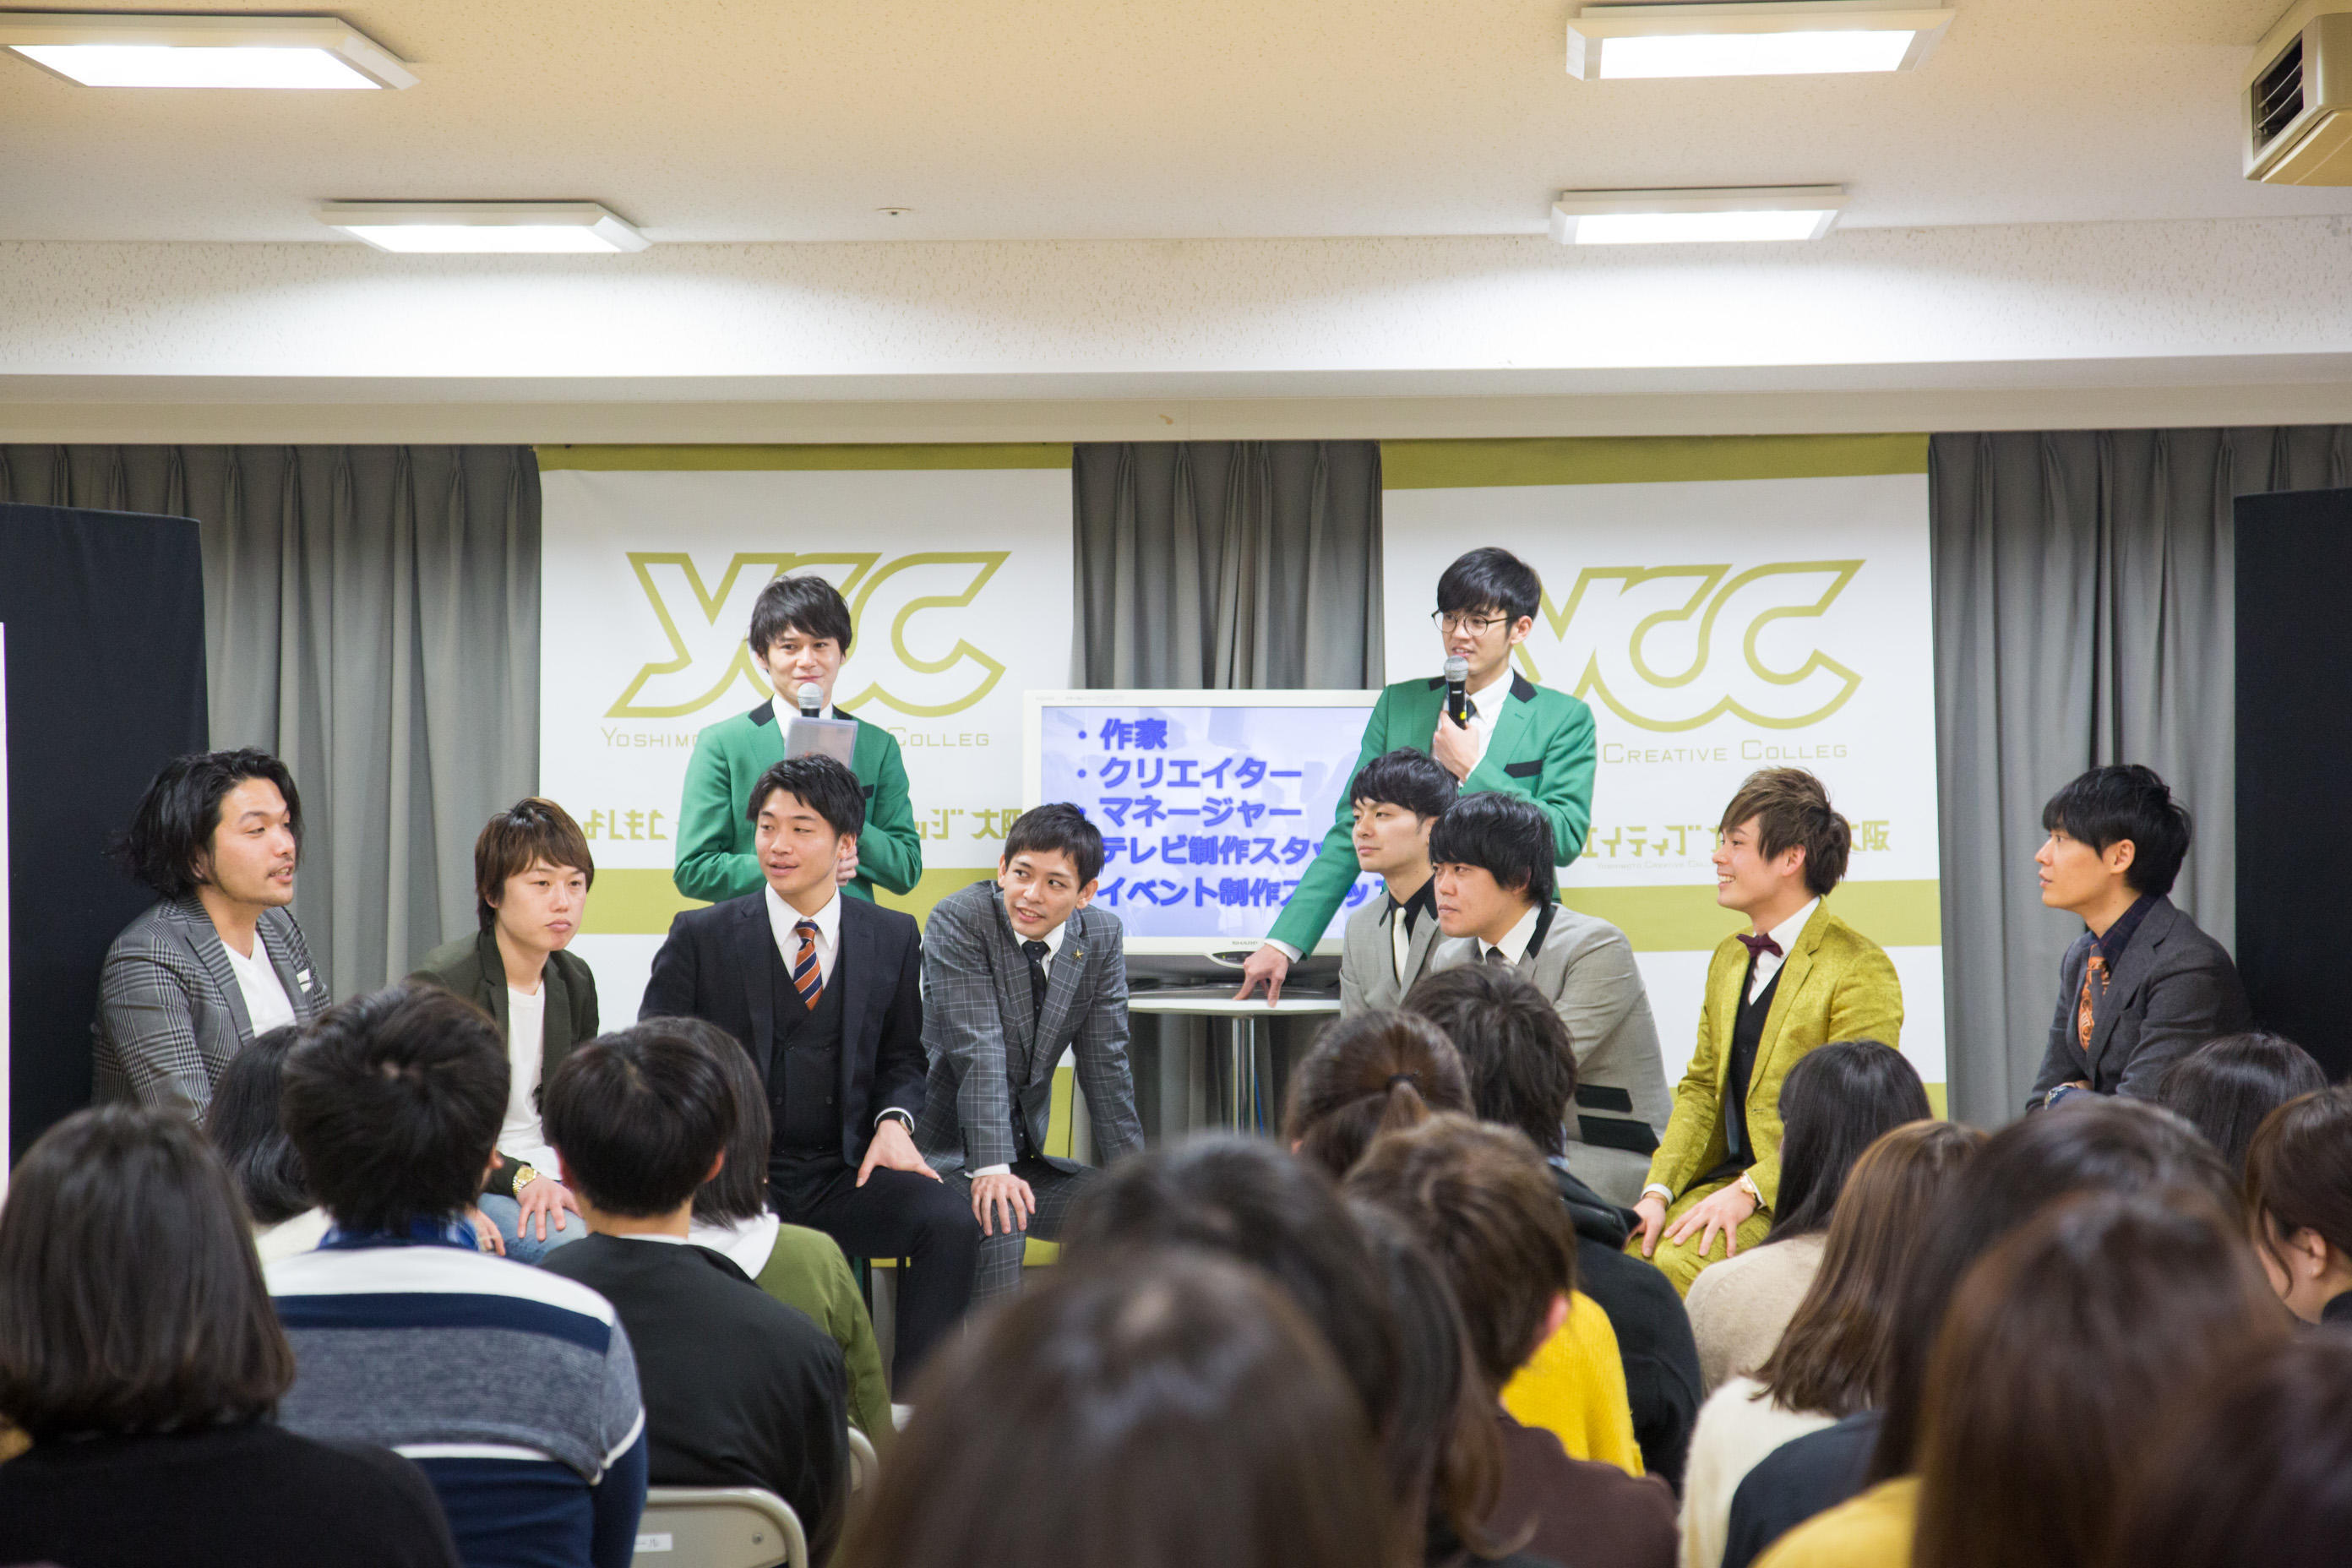 http://news.yoshimoto.co.jp/20180209135553-74a3ef27b48494066138526ab6c880d0dec2d977.jpg